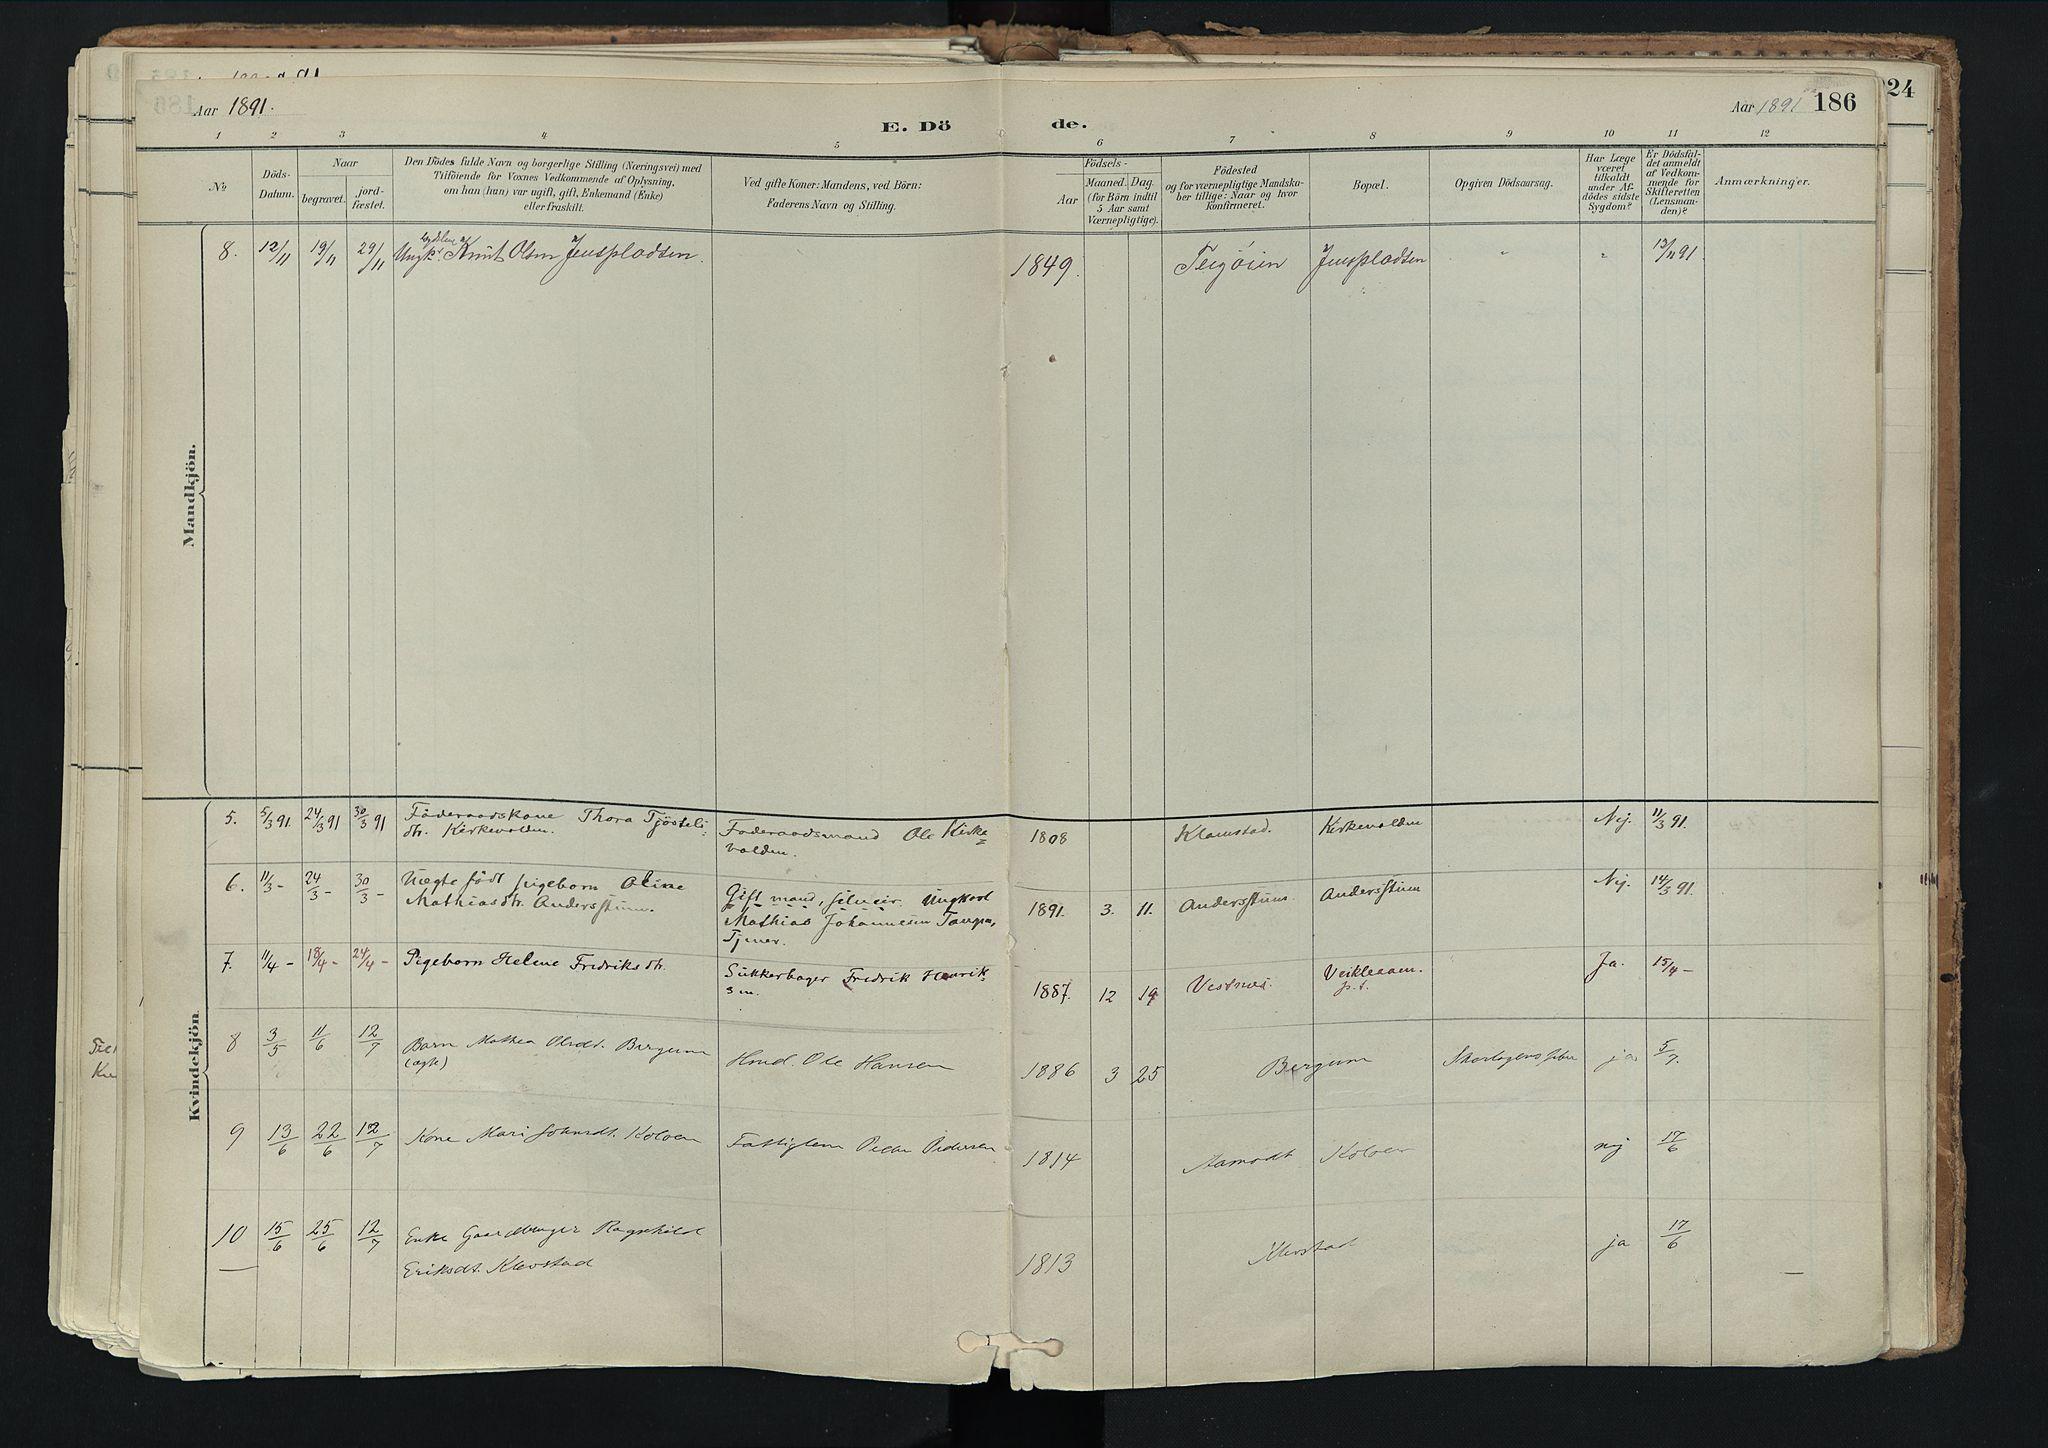 SAH, Nord-Fron prestekontor, Ministerialbok nr. 3, 1884-1914, s. 186